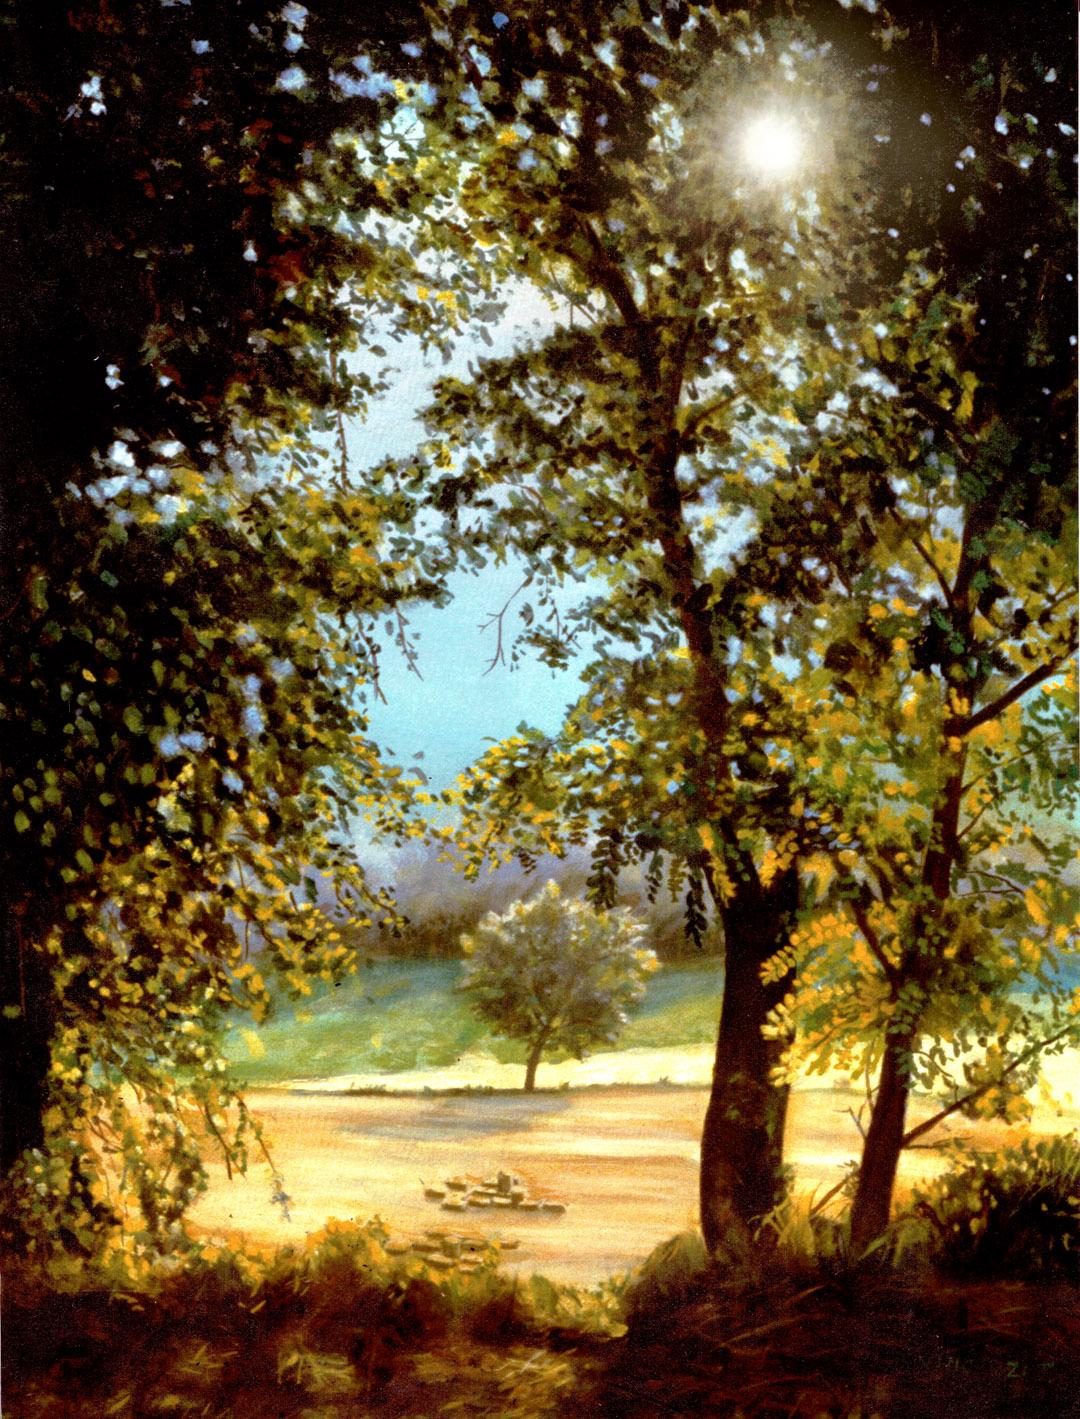 quadri ad Olio Paesaggi Naturalistici classici e Impressionisti